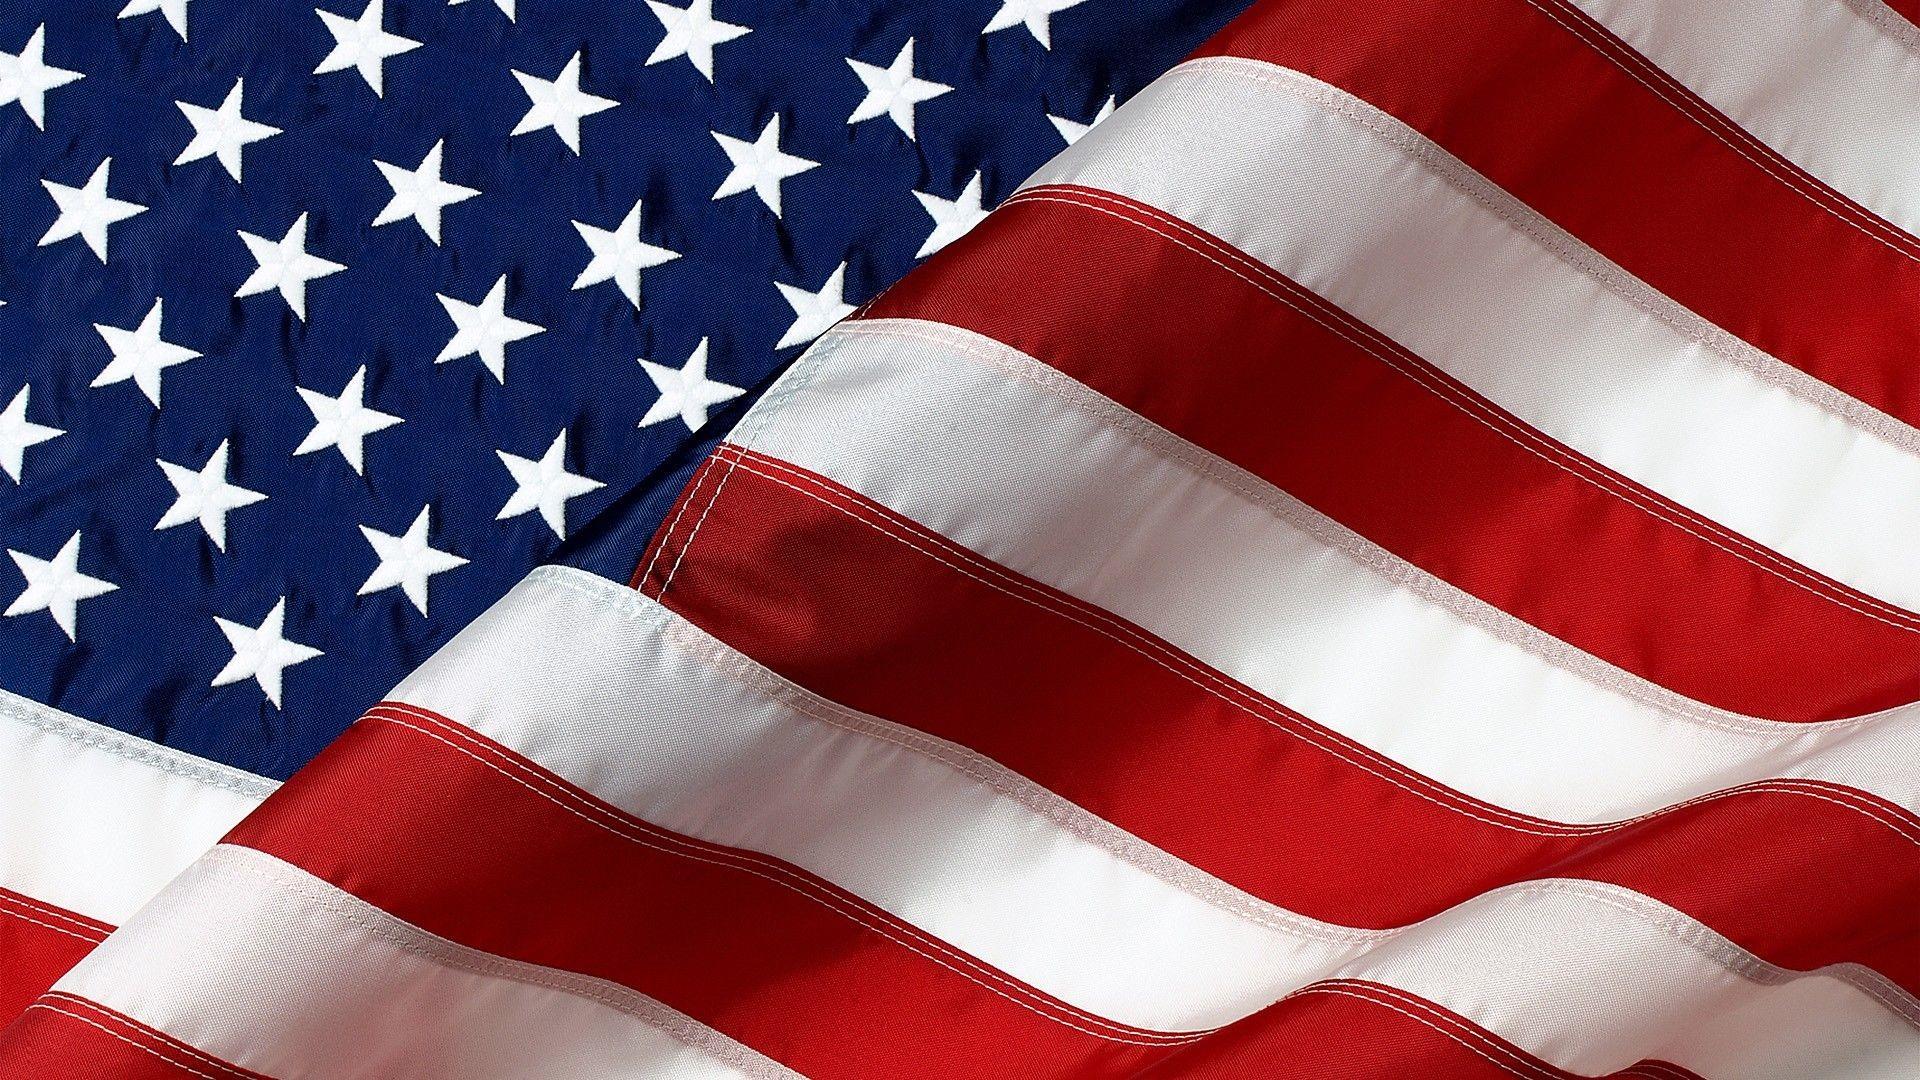 best ideas about American flag wallpaper on Pinterest